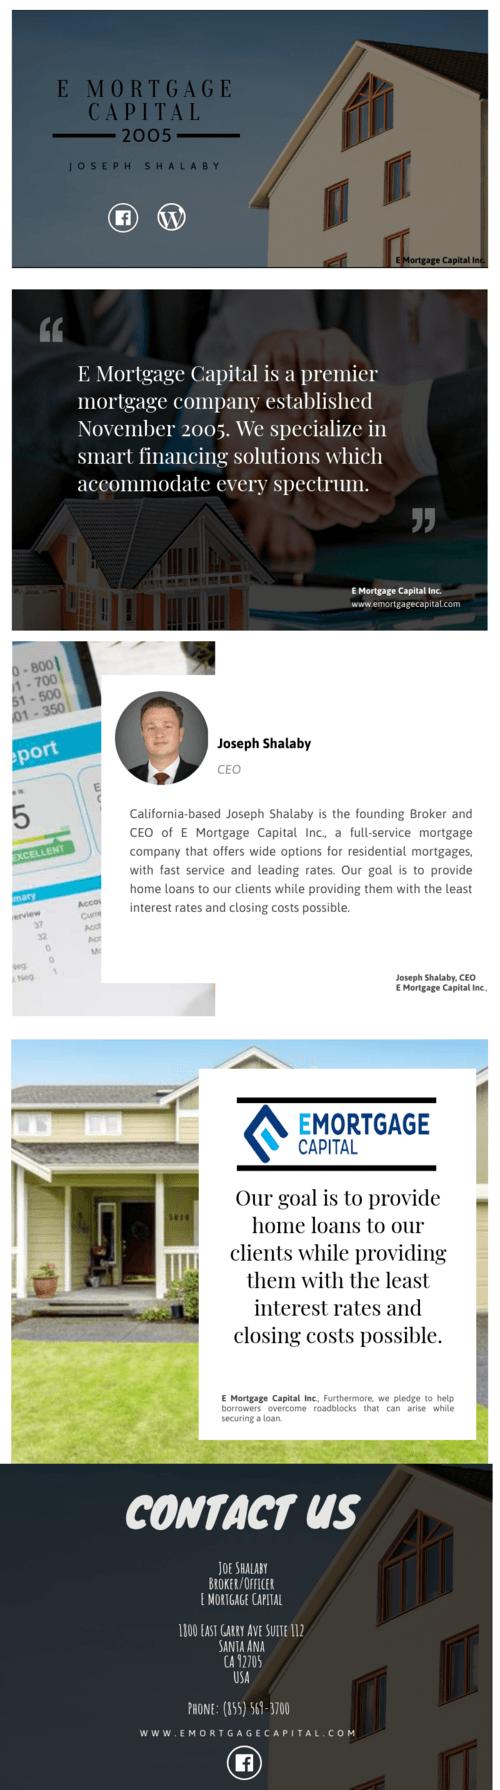 E Mortgage Capital | Joseph Shalaby via Joseph Shalaby